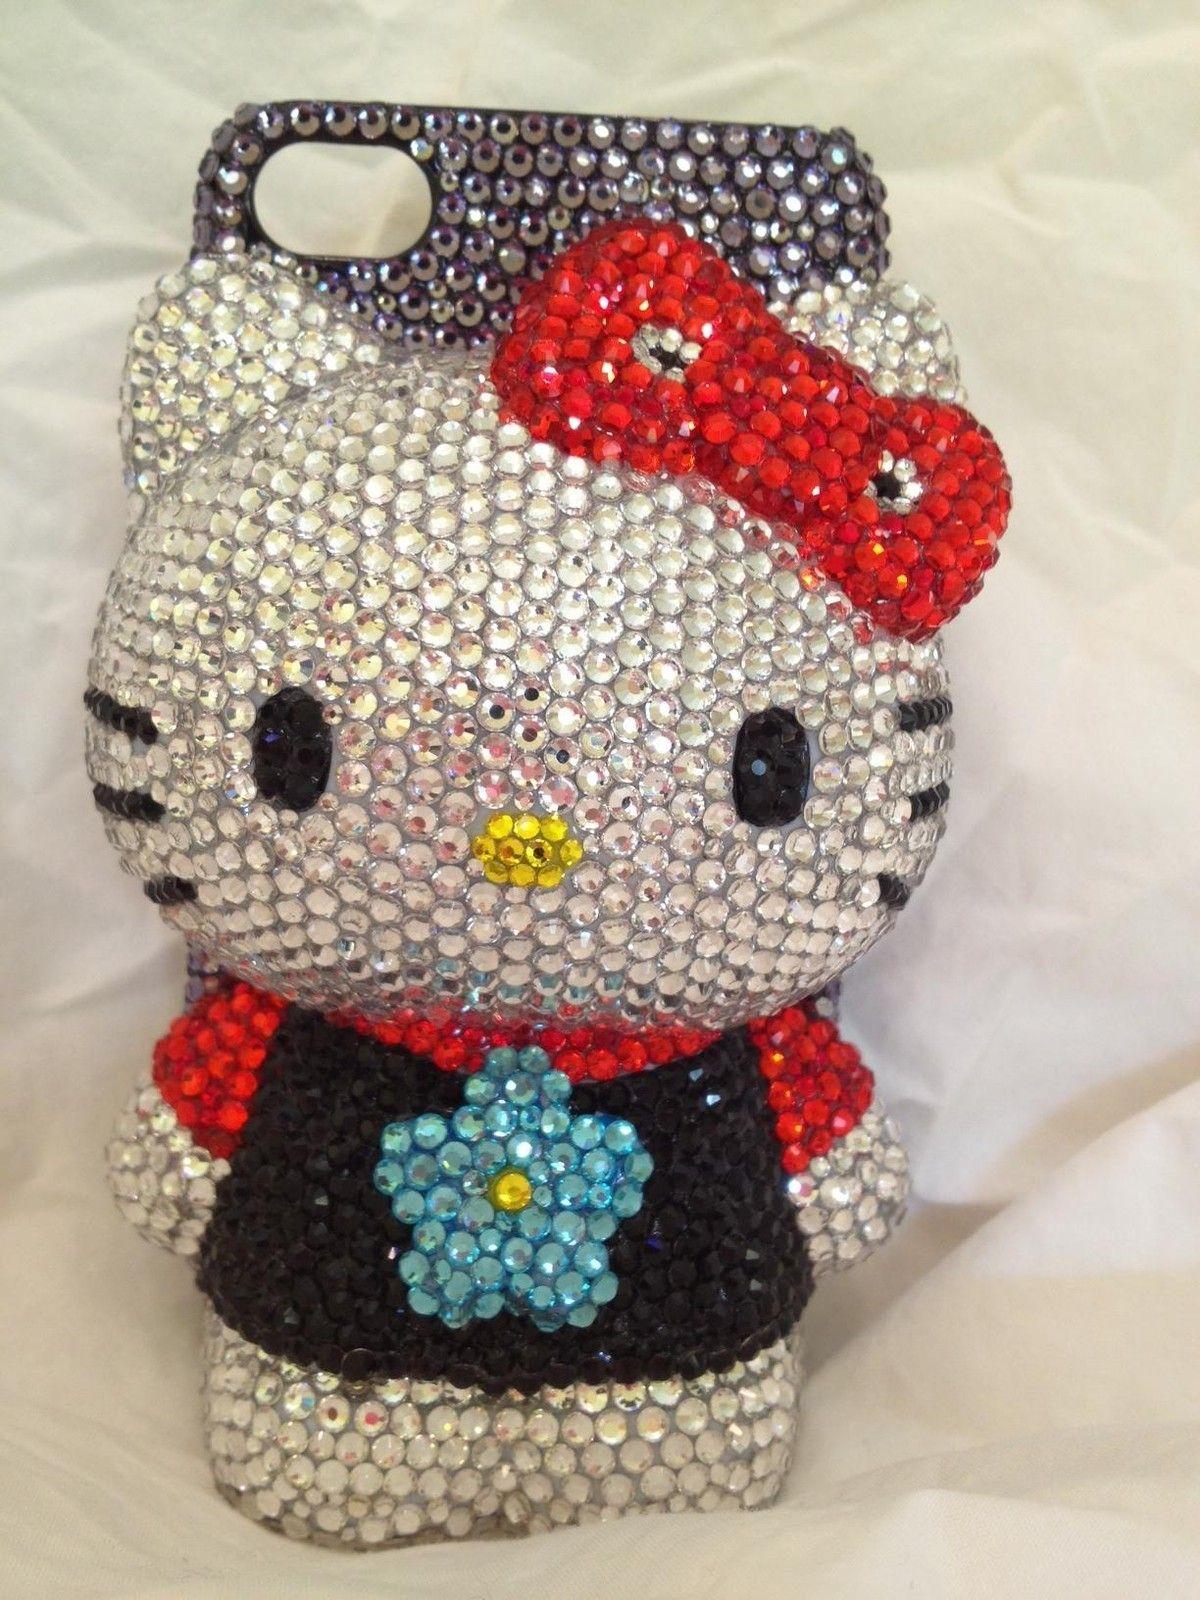 Iphone 4 4S bling crystal hello kitty Handmade 3D hard cover case gift | eBay